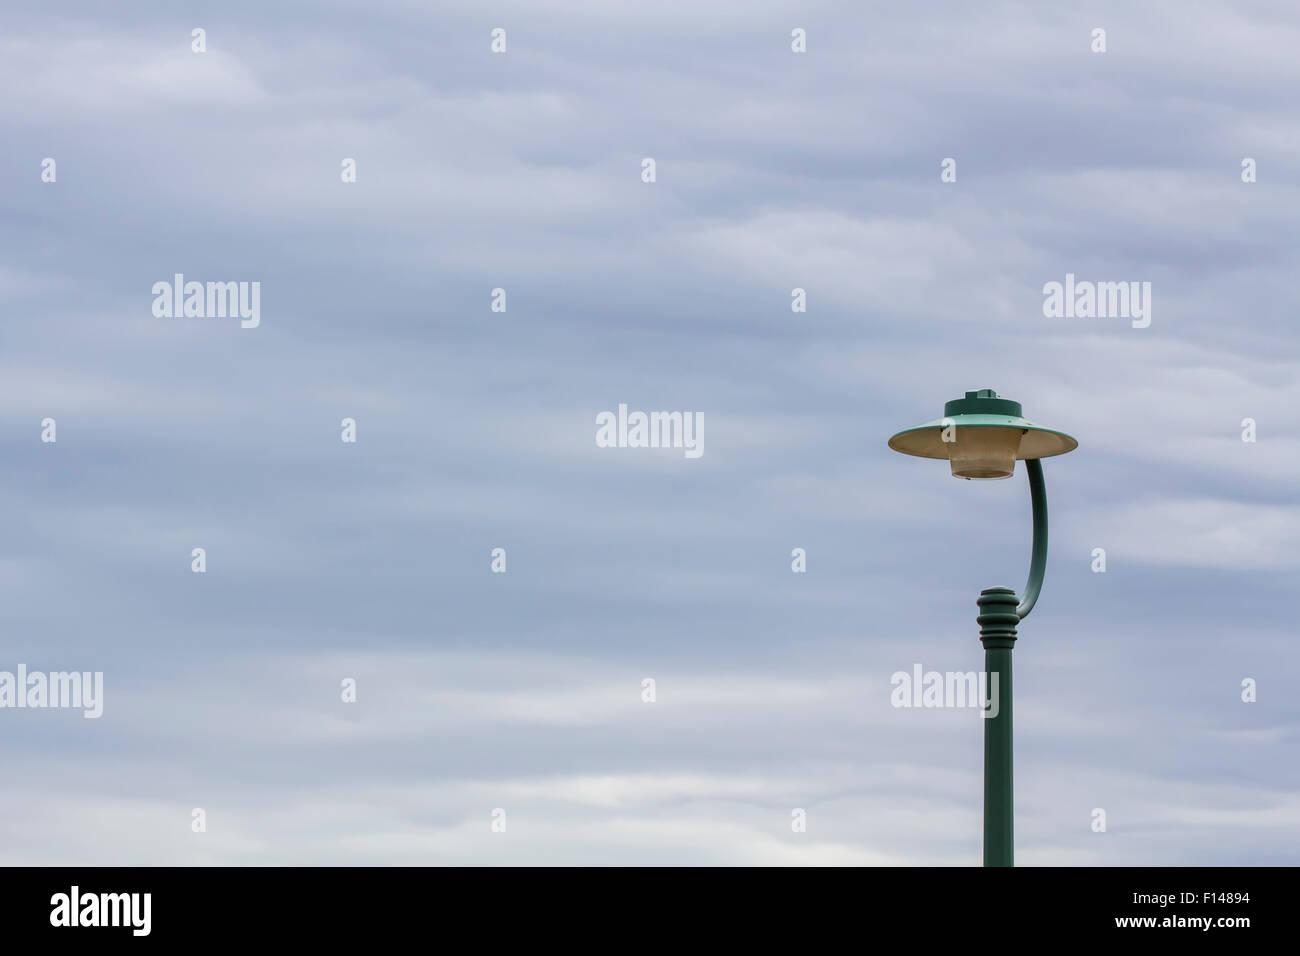 Street light seen on a cloudy day. Brisbane, Queensland, Australia. - Stock Image